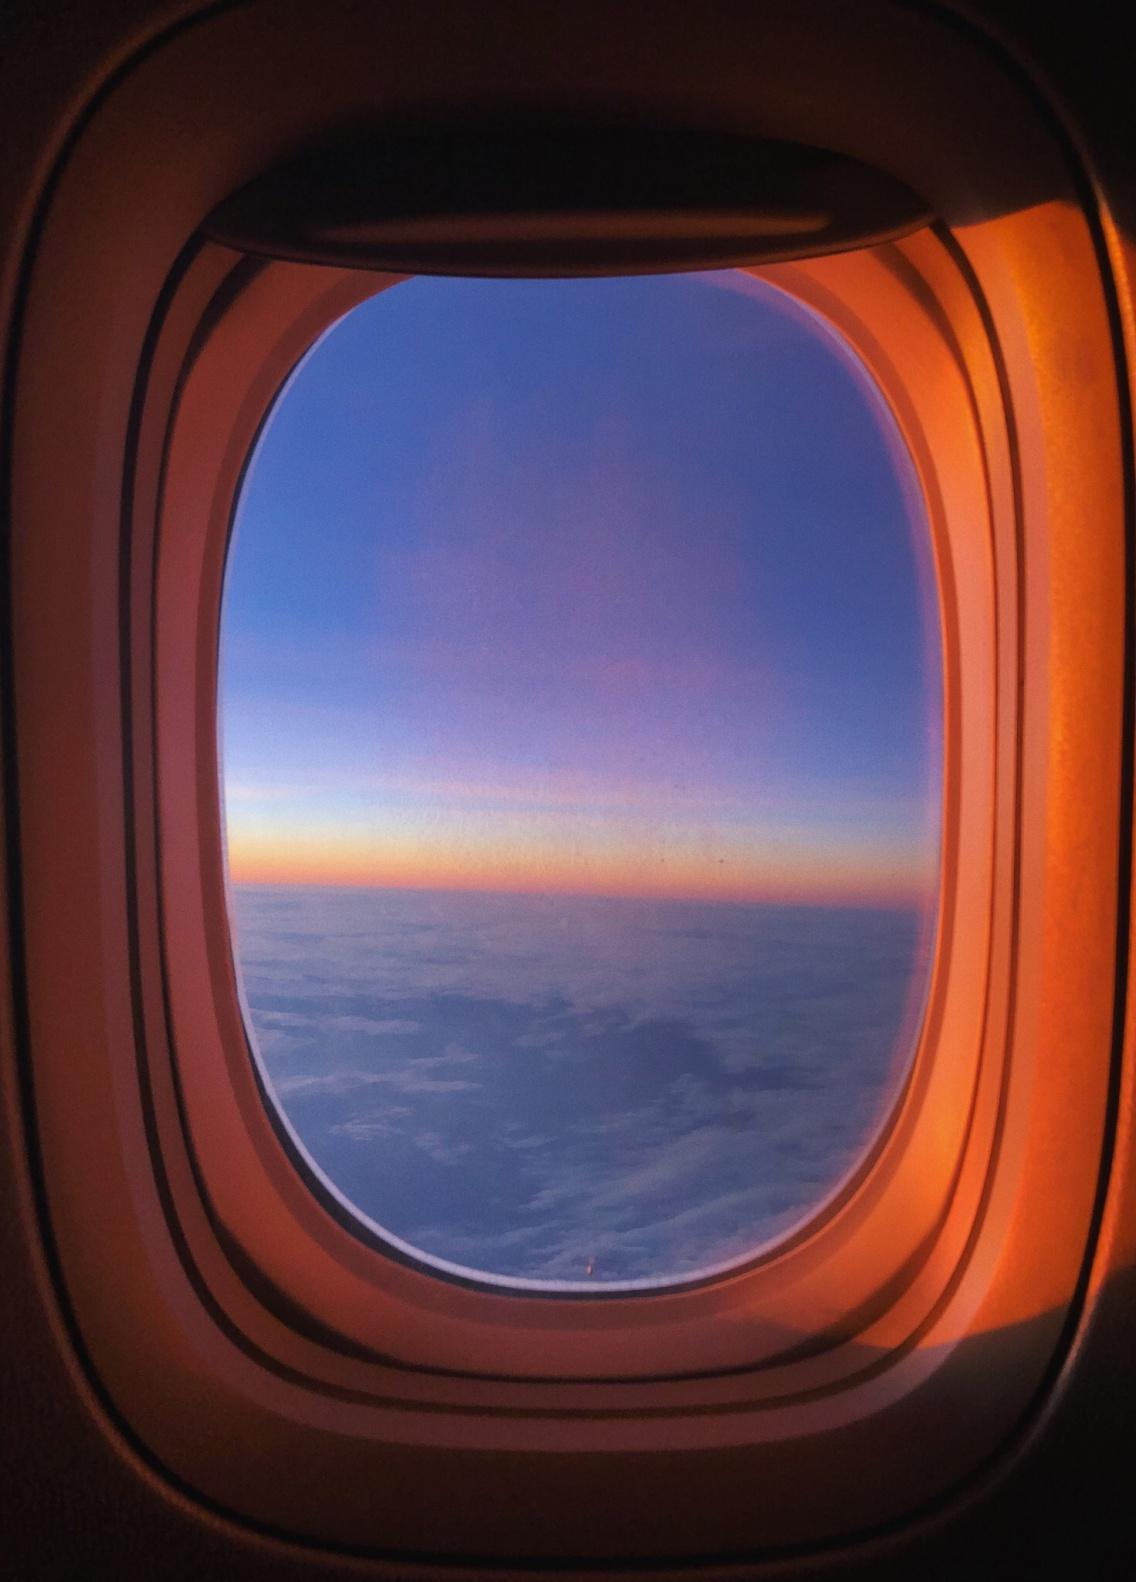 𝙼𝚒𝚍𝚍𝚕𝚎 𝙾𝚏 𝙽𝚘𝚠𝚑𝚎𝚛𝚎 Travelling Plane Sky